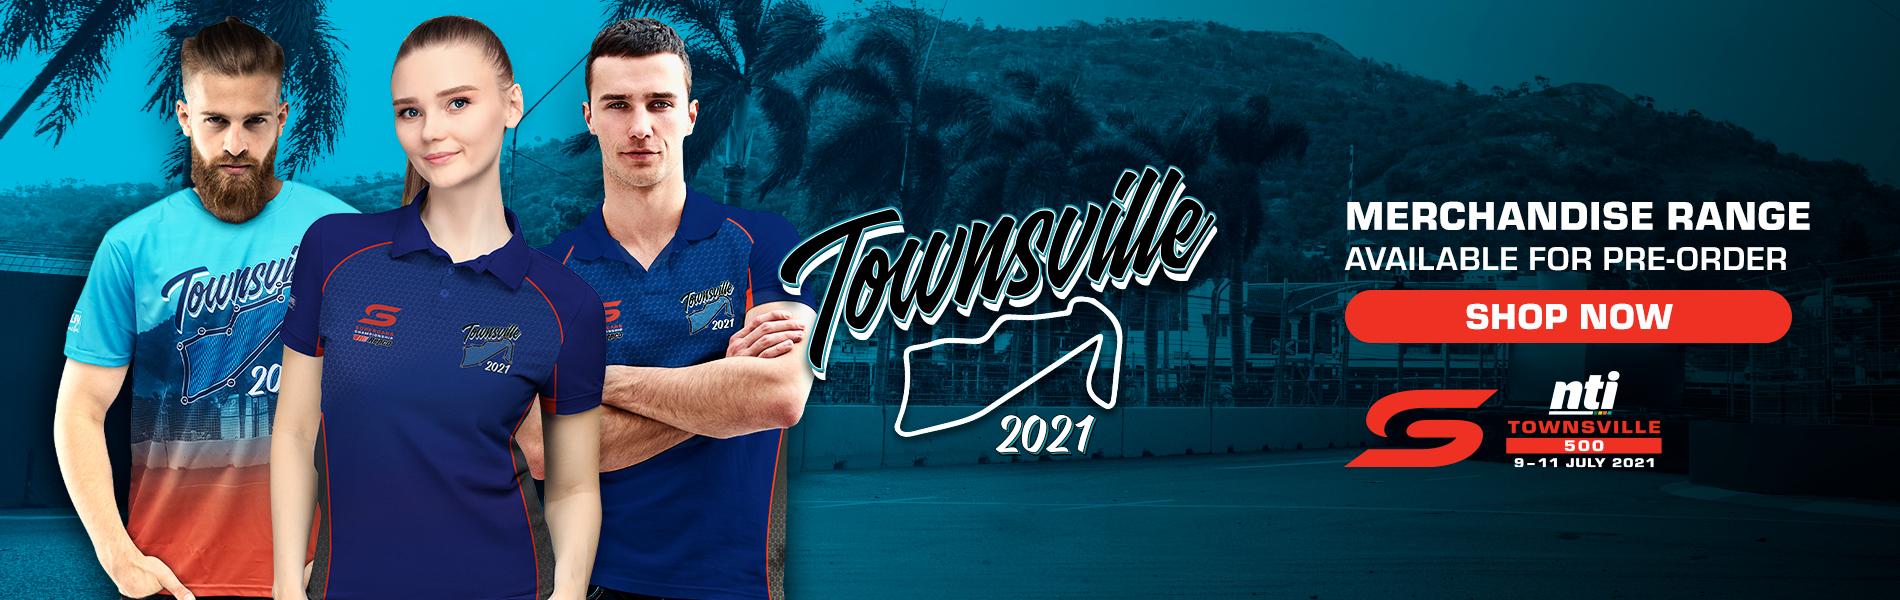 Towsville-range-2021-Homepage